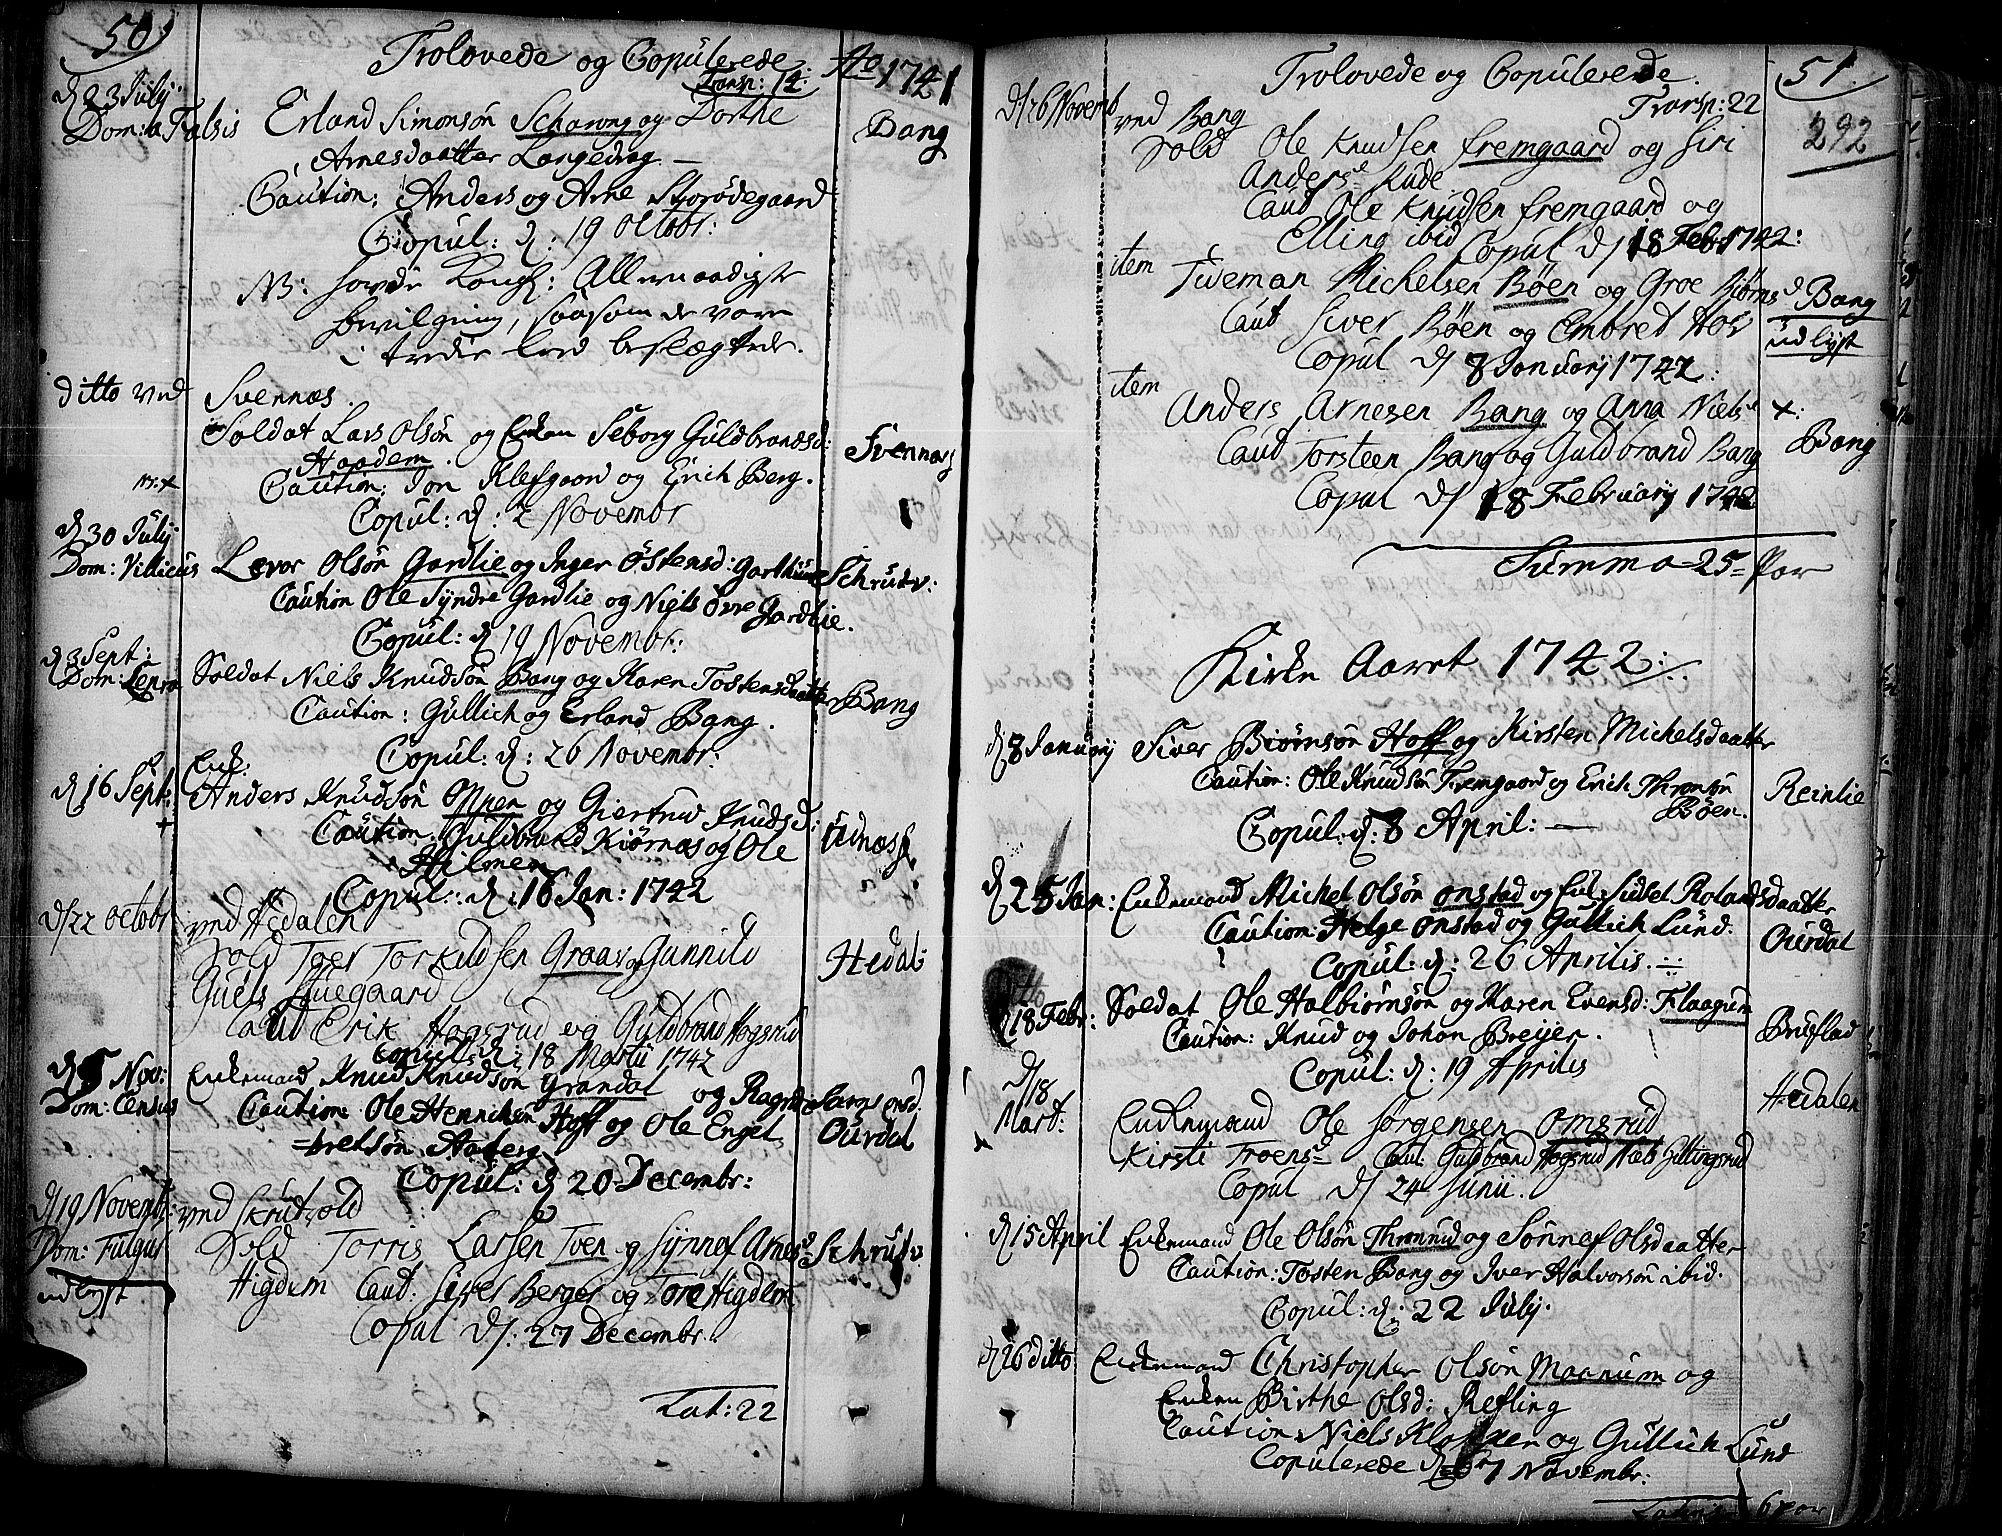 SAH, Aurdal prestekontor, Ministerialbok nr. 4, 1730-1762, s. 50-51